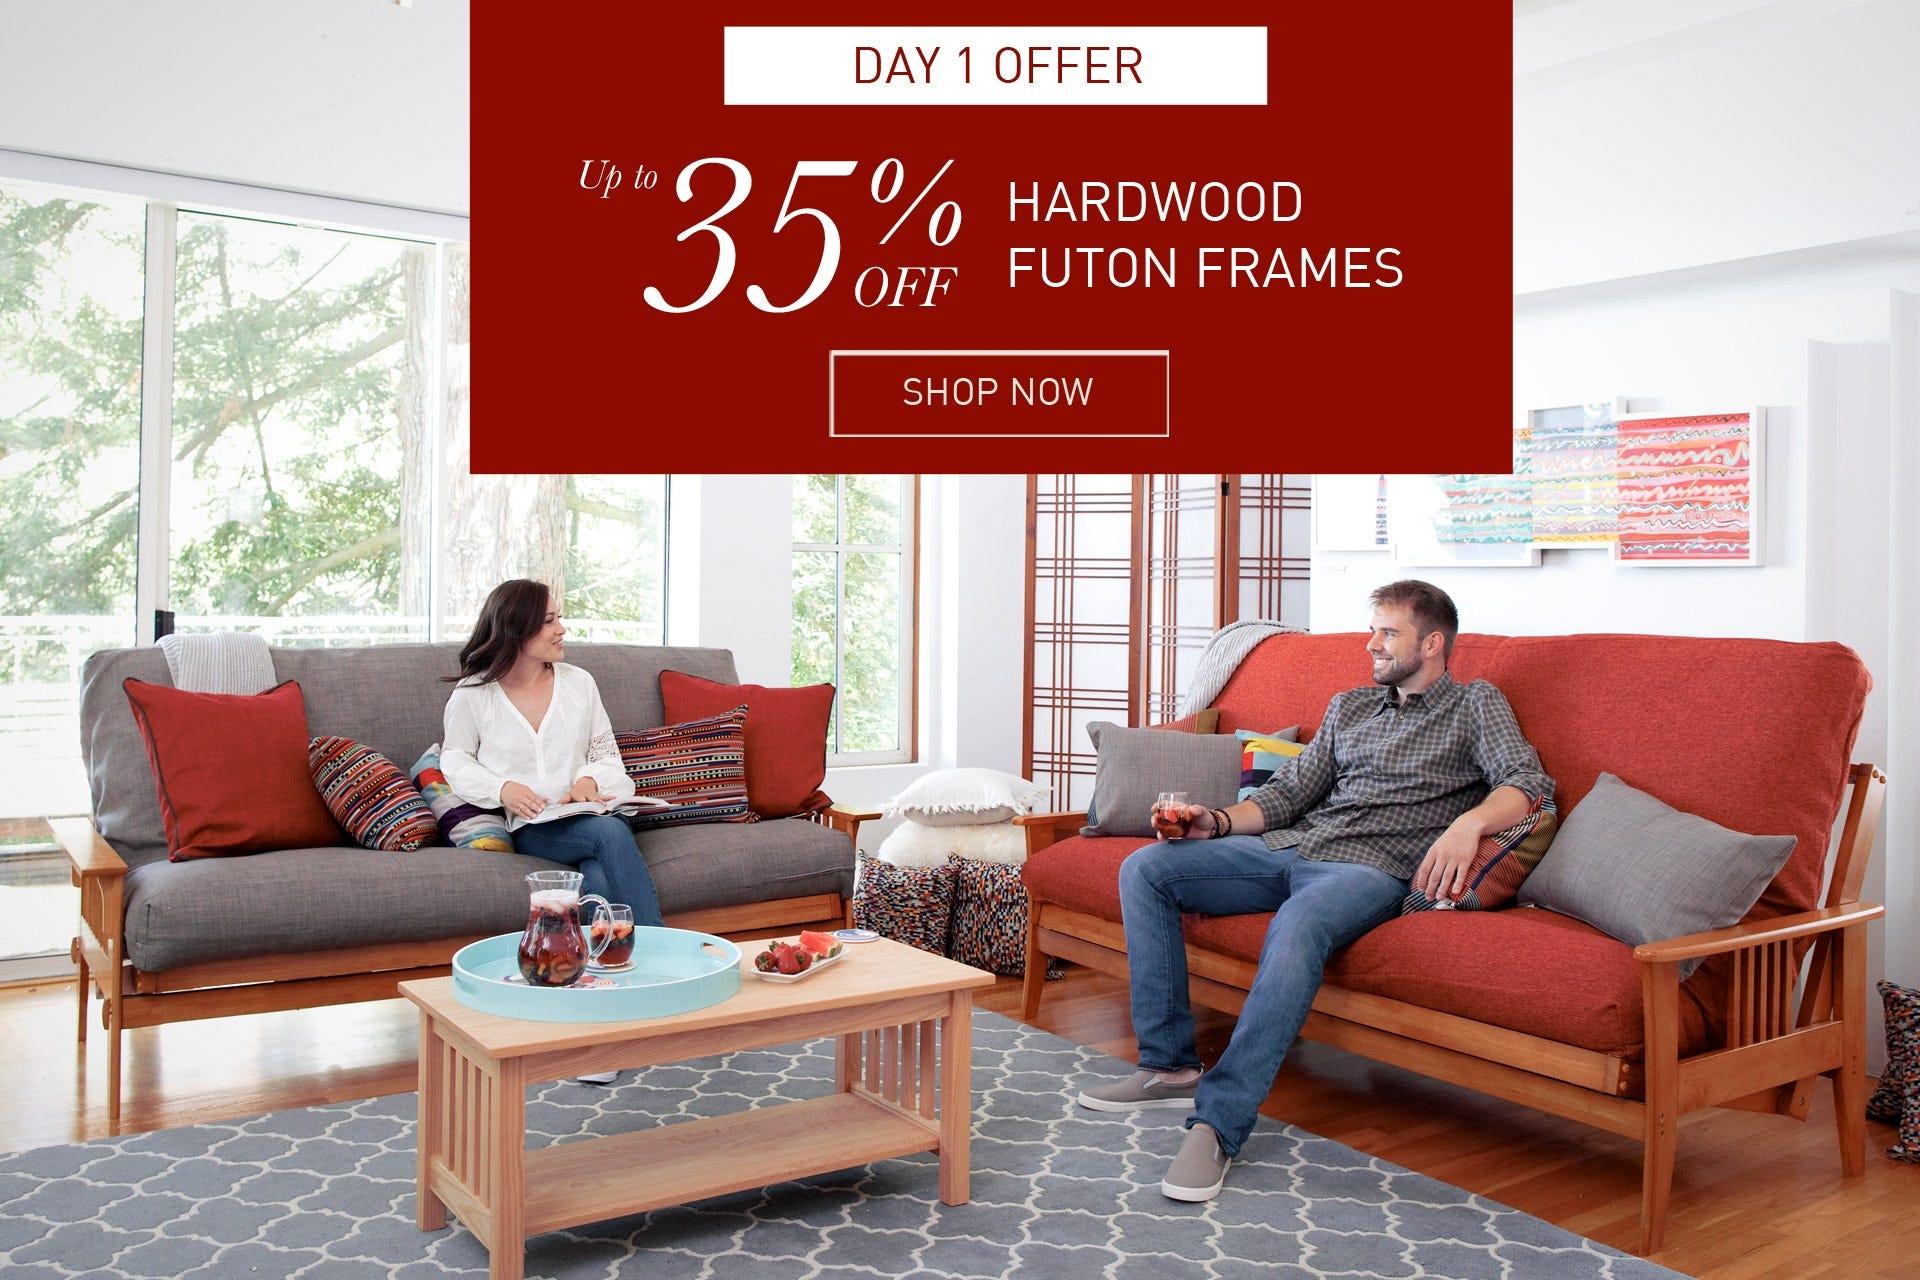 Hardwood futon frames